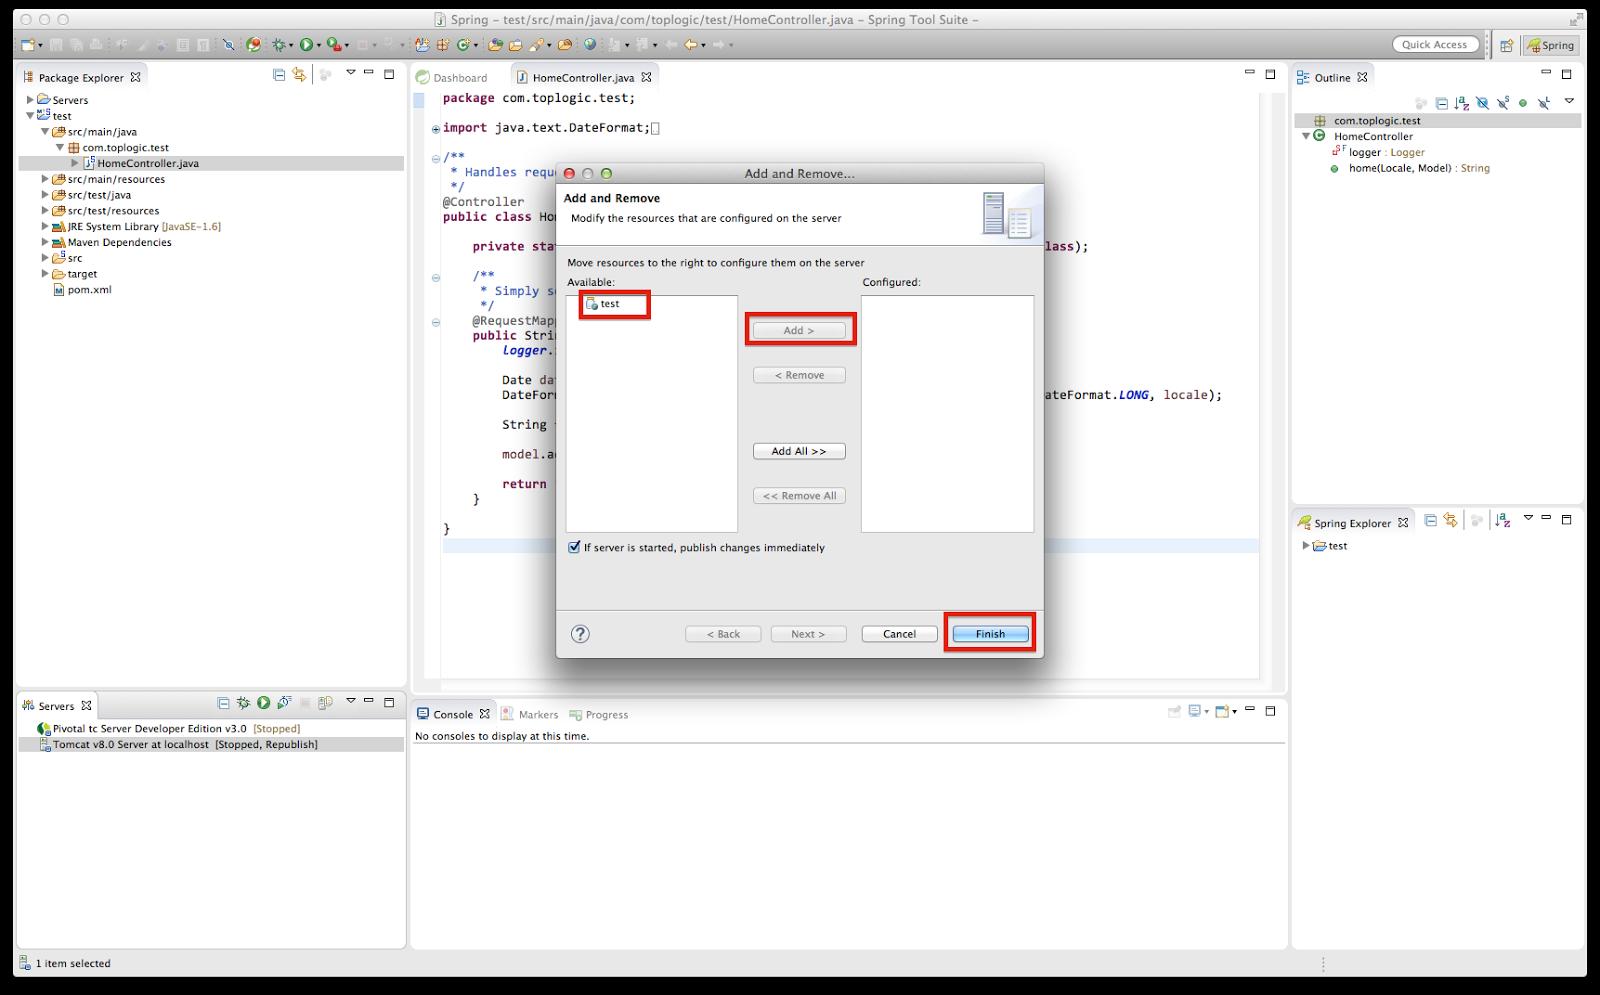 how to run apache server on mac